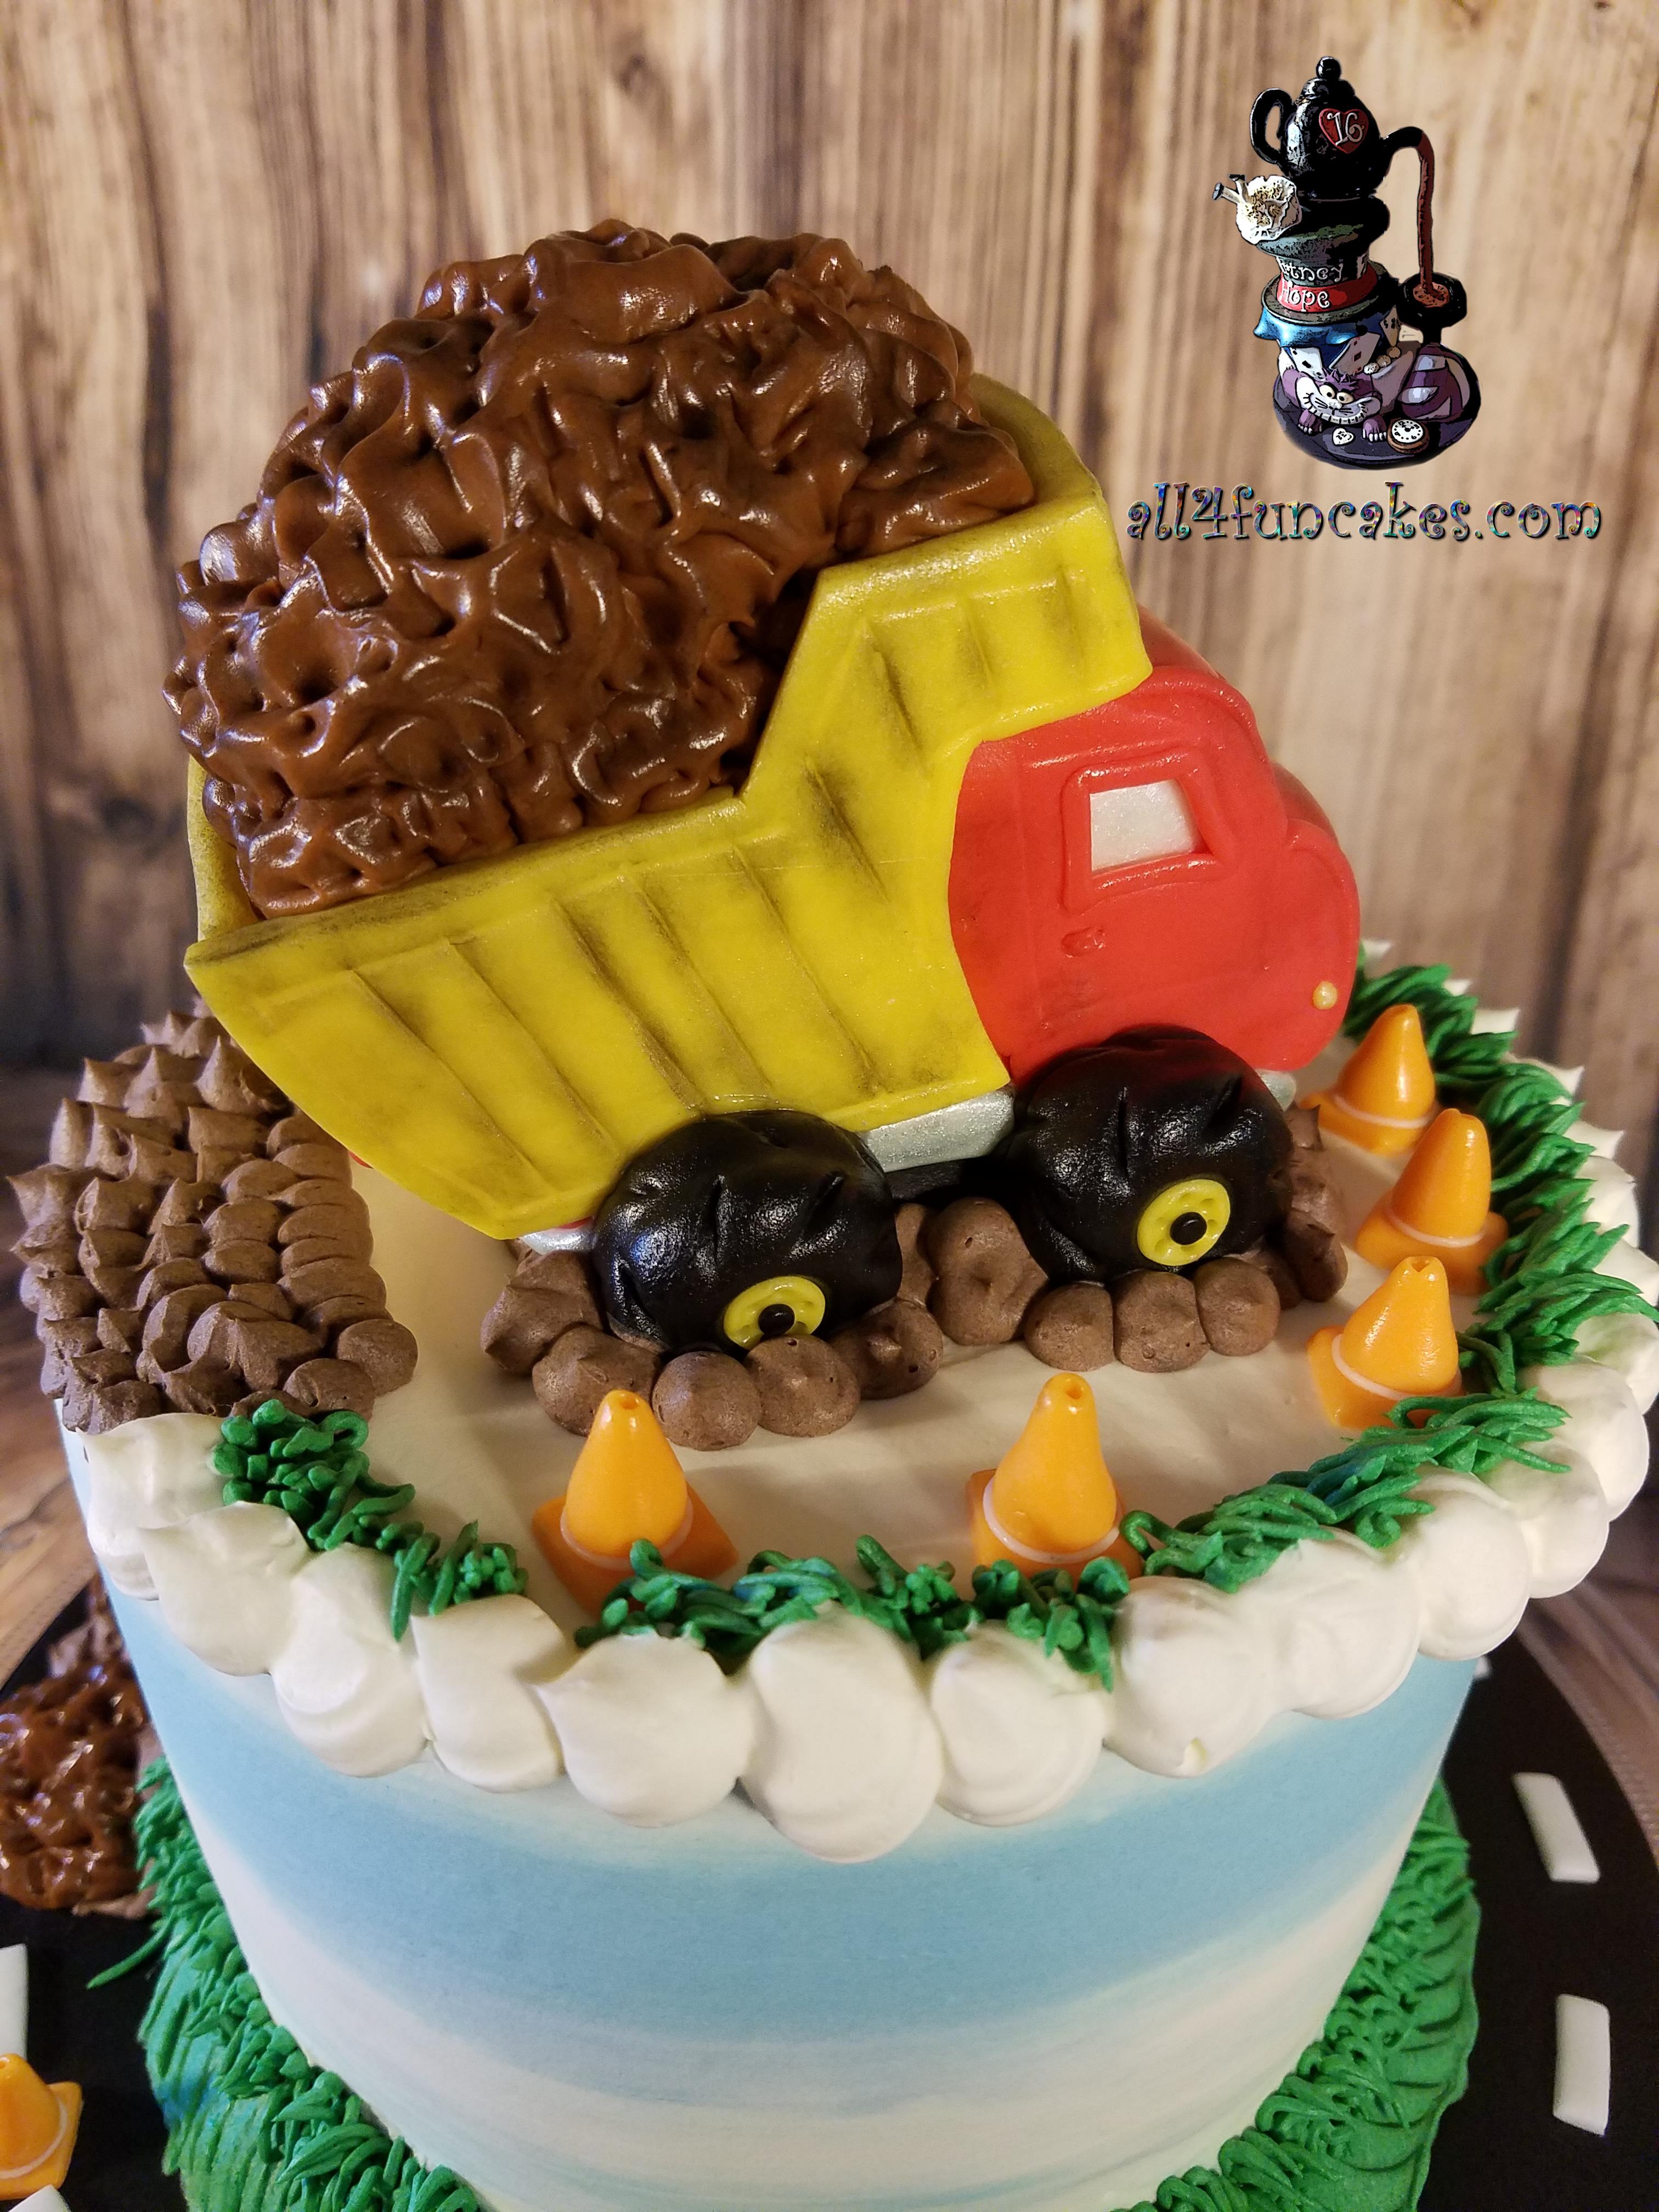 Phenomenal Dump Truck Construction Birthday Cake By All4Fun Cakes 07 Funny Birthday Cards Online Fluifree Goldxyz